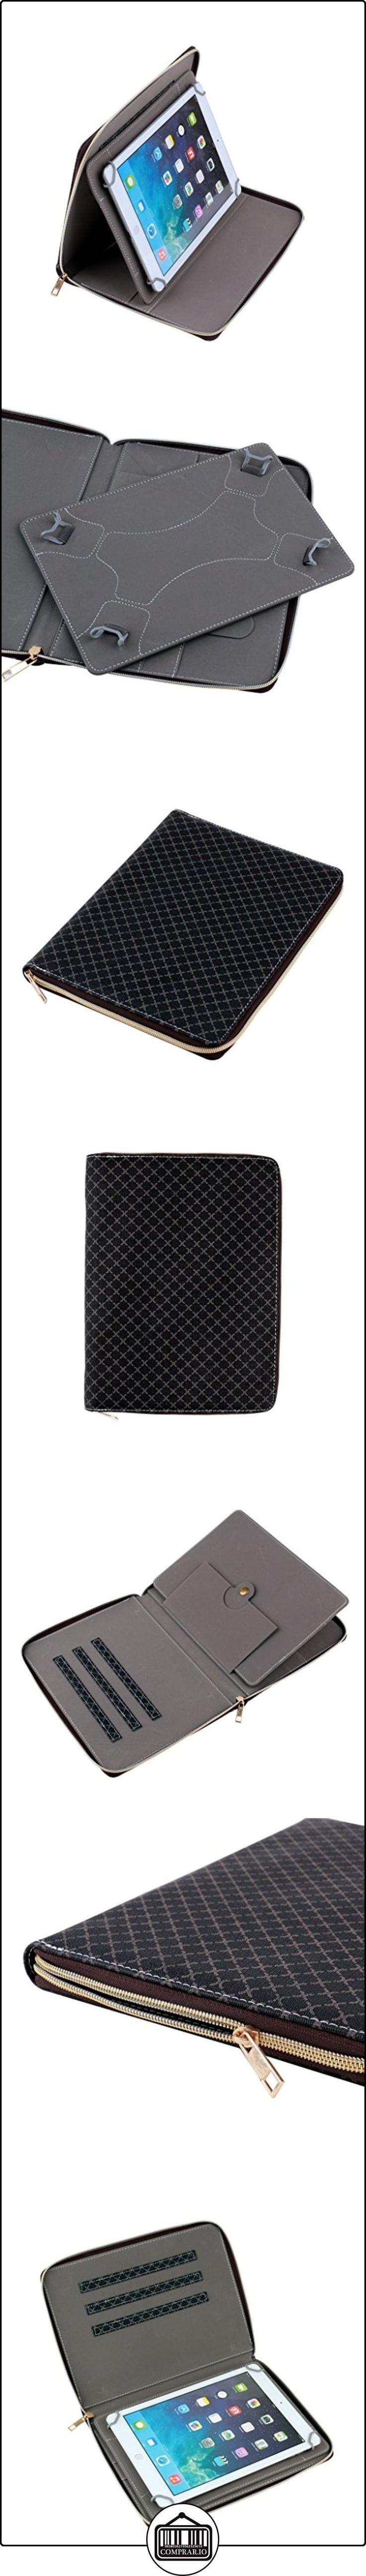 "Nice Quality Premium 7"" 7.7"" 8 7 inch 8 inch Tablet PC MID PU Leather Protect Cover Case Stand with 360 Hortizontal and Vertical Rotation view for Apple, Samsung, HTC, Blackburry, Lenovo , Bush, Nexus, Kodak, Polaroid, Sony, Linx, Toshiba, Wikipad, Tesco Hudl,LG , HP, Microsoft , ebooks, any Tablet between 7 inch to 8.1 inch  ✿ Regalos para recién nacidos - Bebes ✿ ▬► Ver oferta: http://comprar.io/goto/B00ZA165DK"